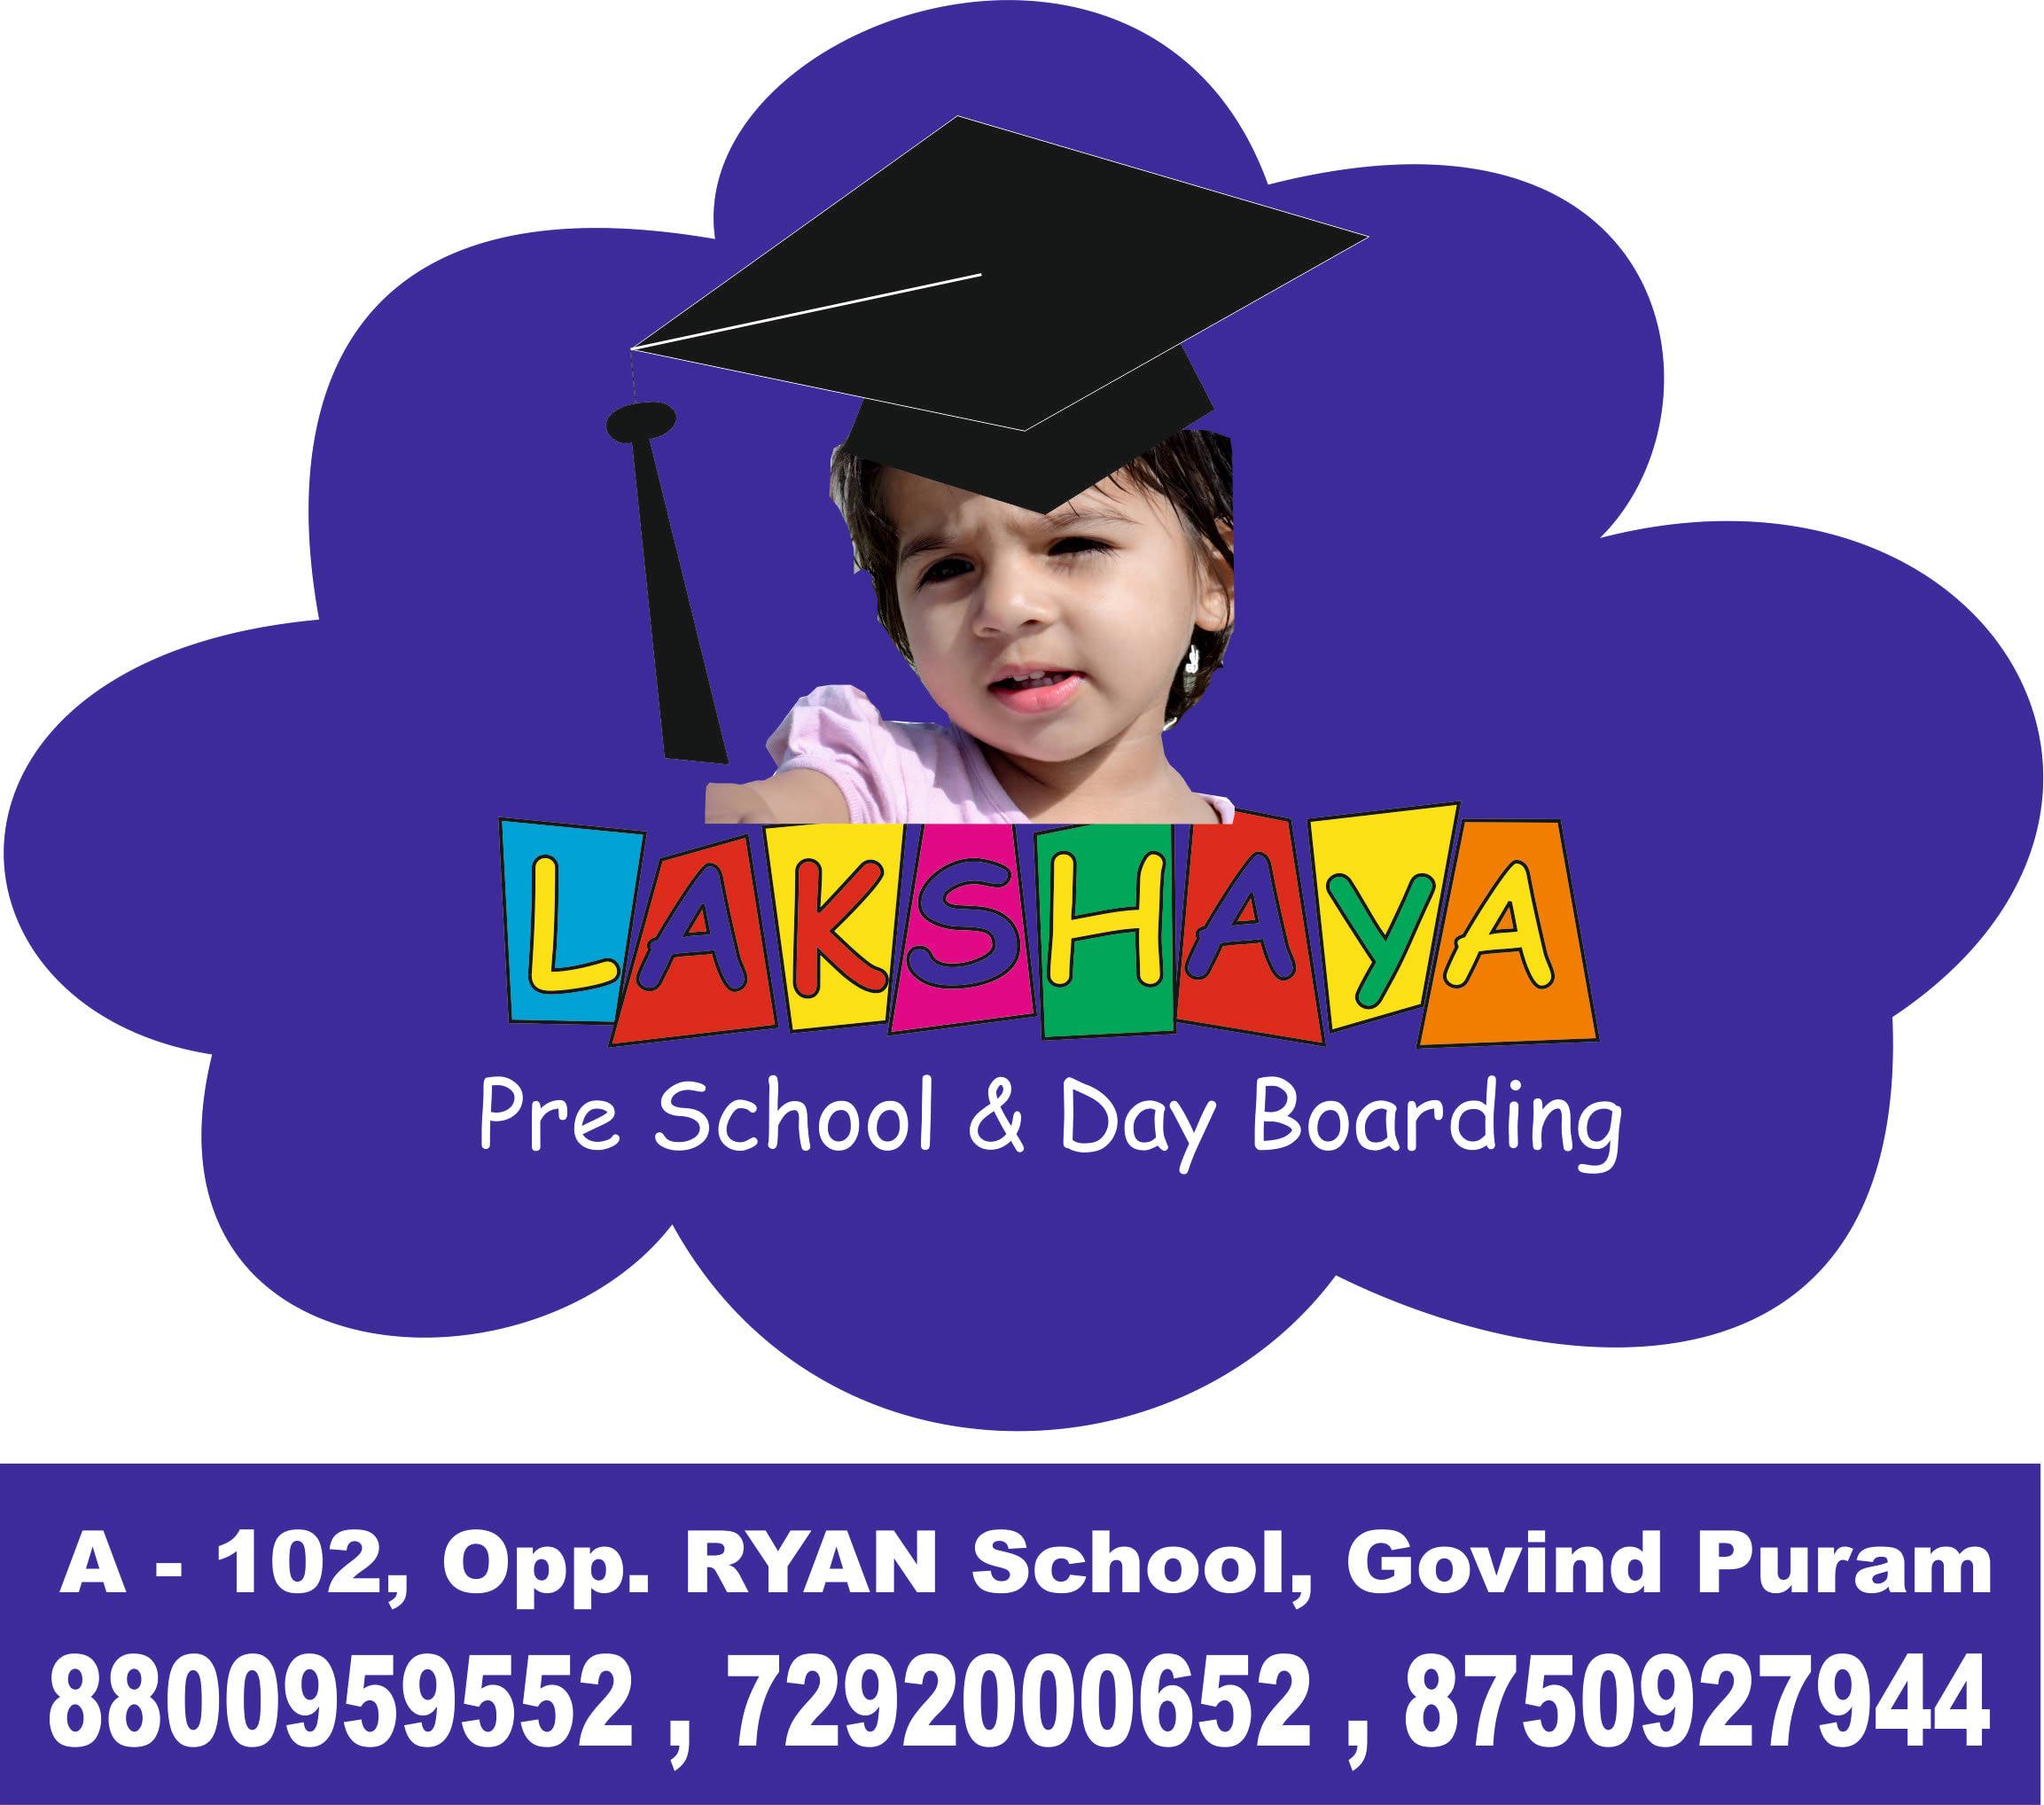 Lakshaya Pre School